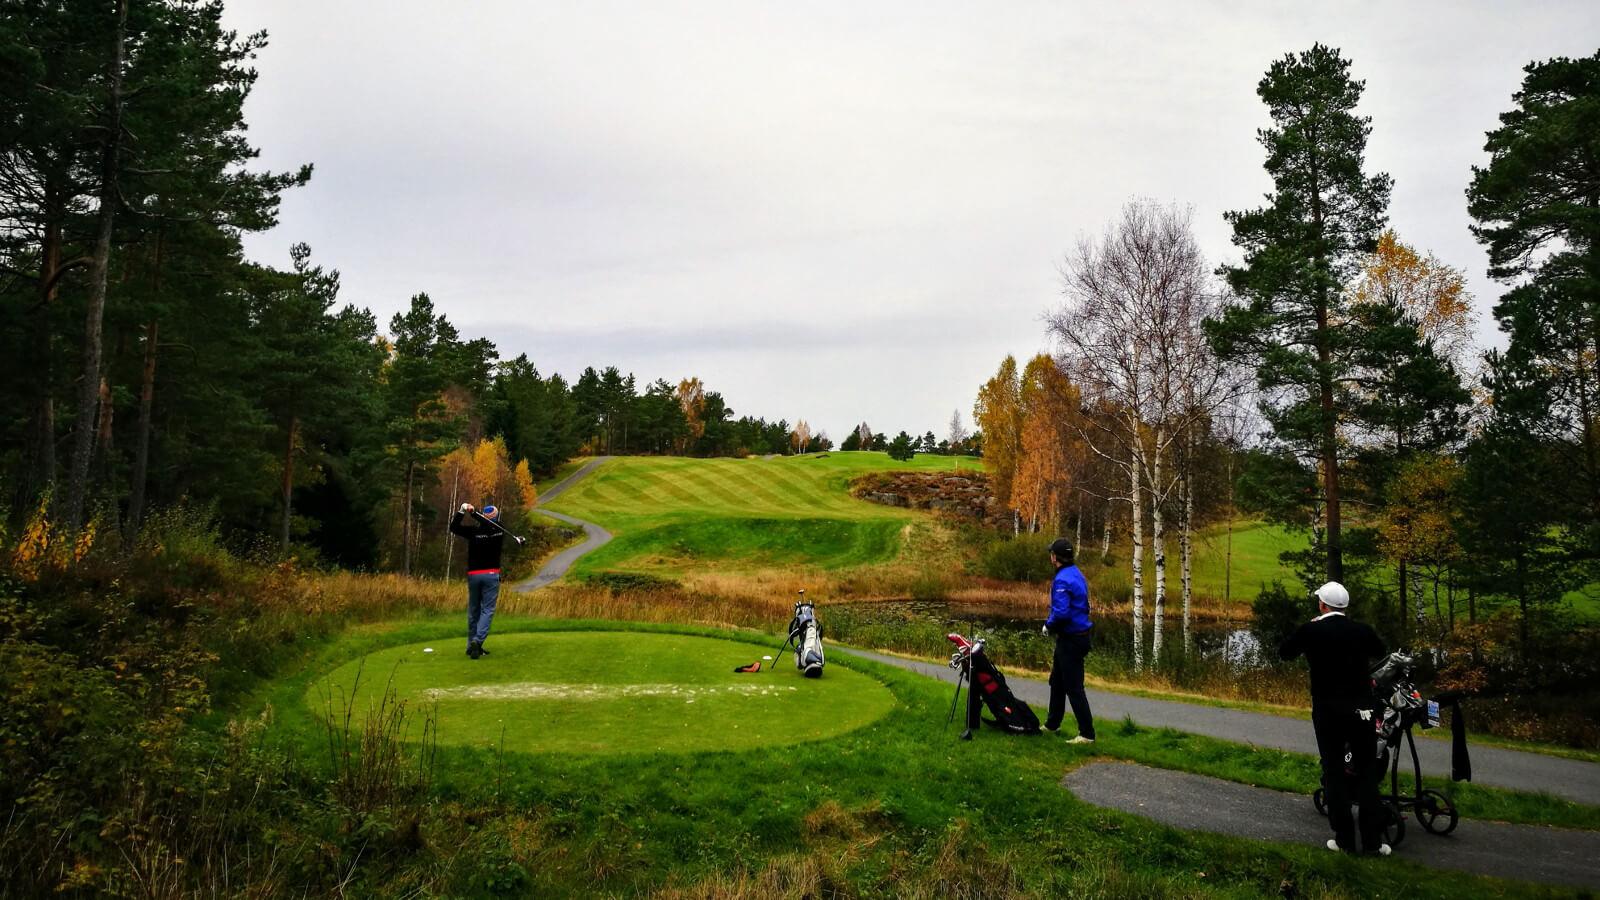 Hull 9, Kragerø Golfklubb